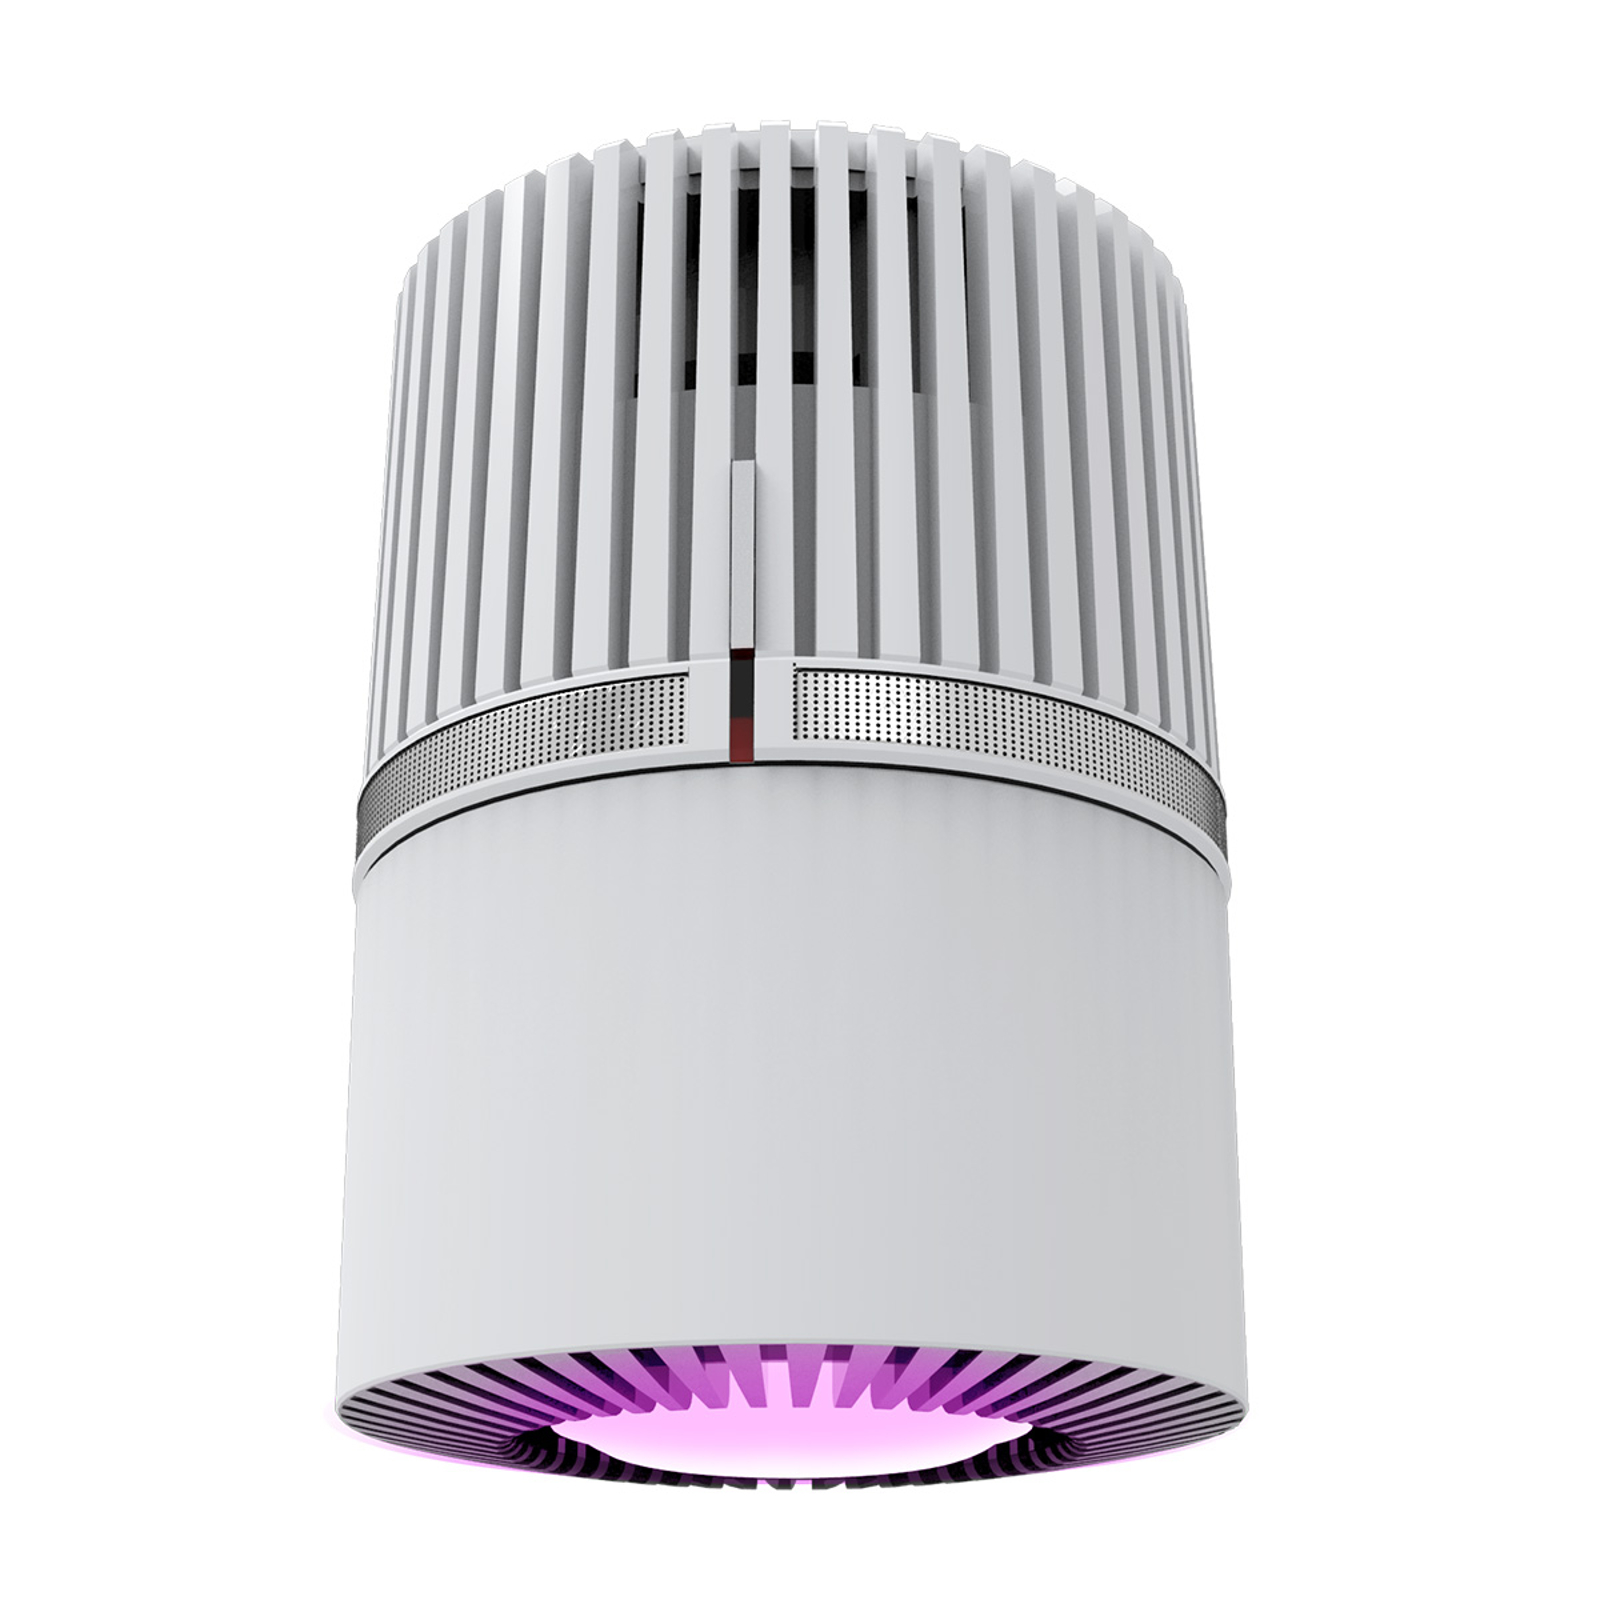 AwoX SafeLIGHT Rauchmelder + Color GU10 LED-Lampe